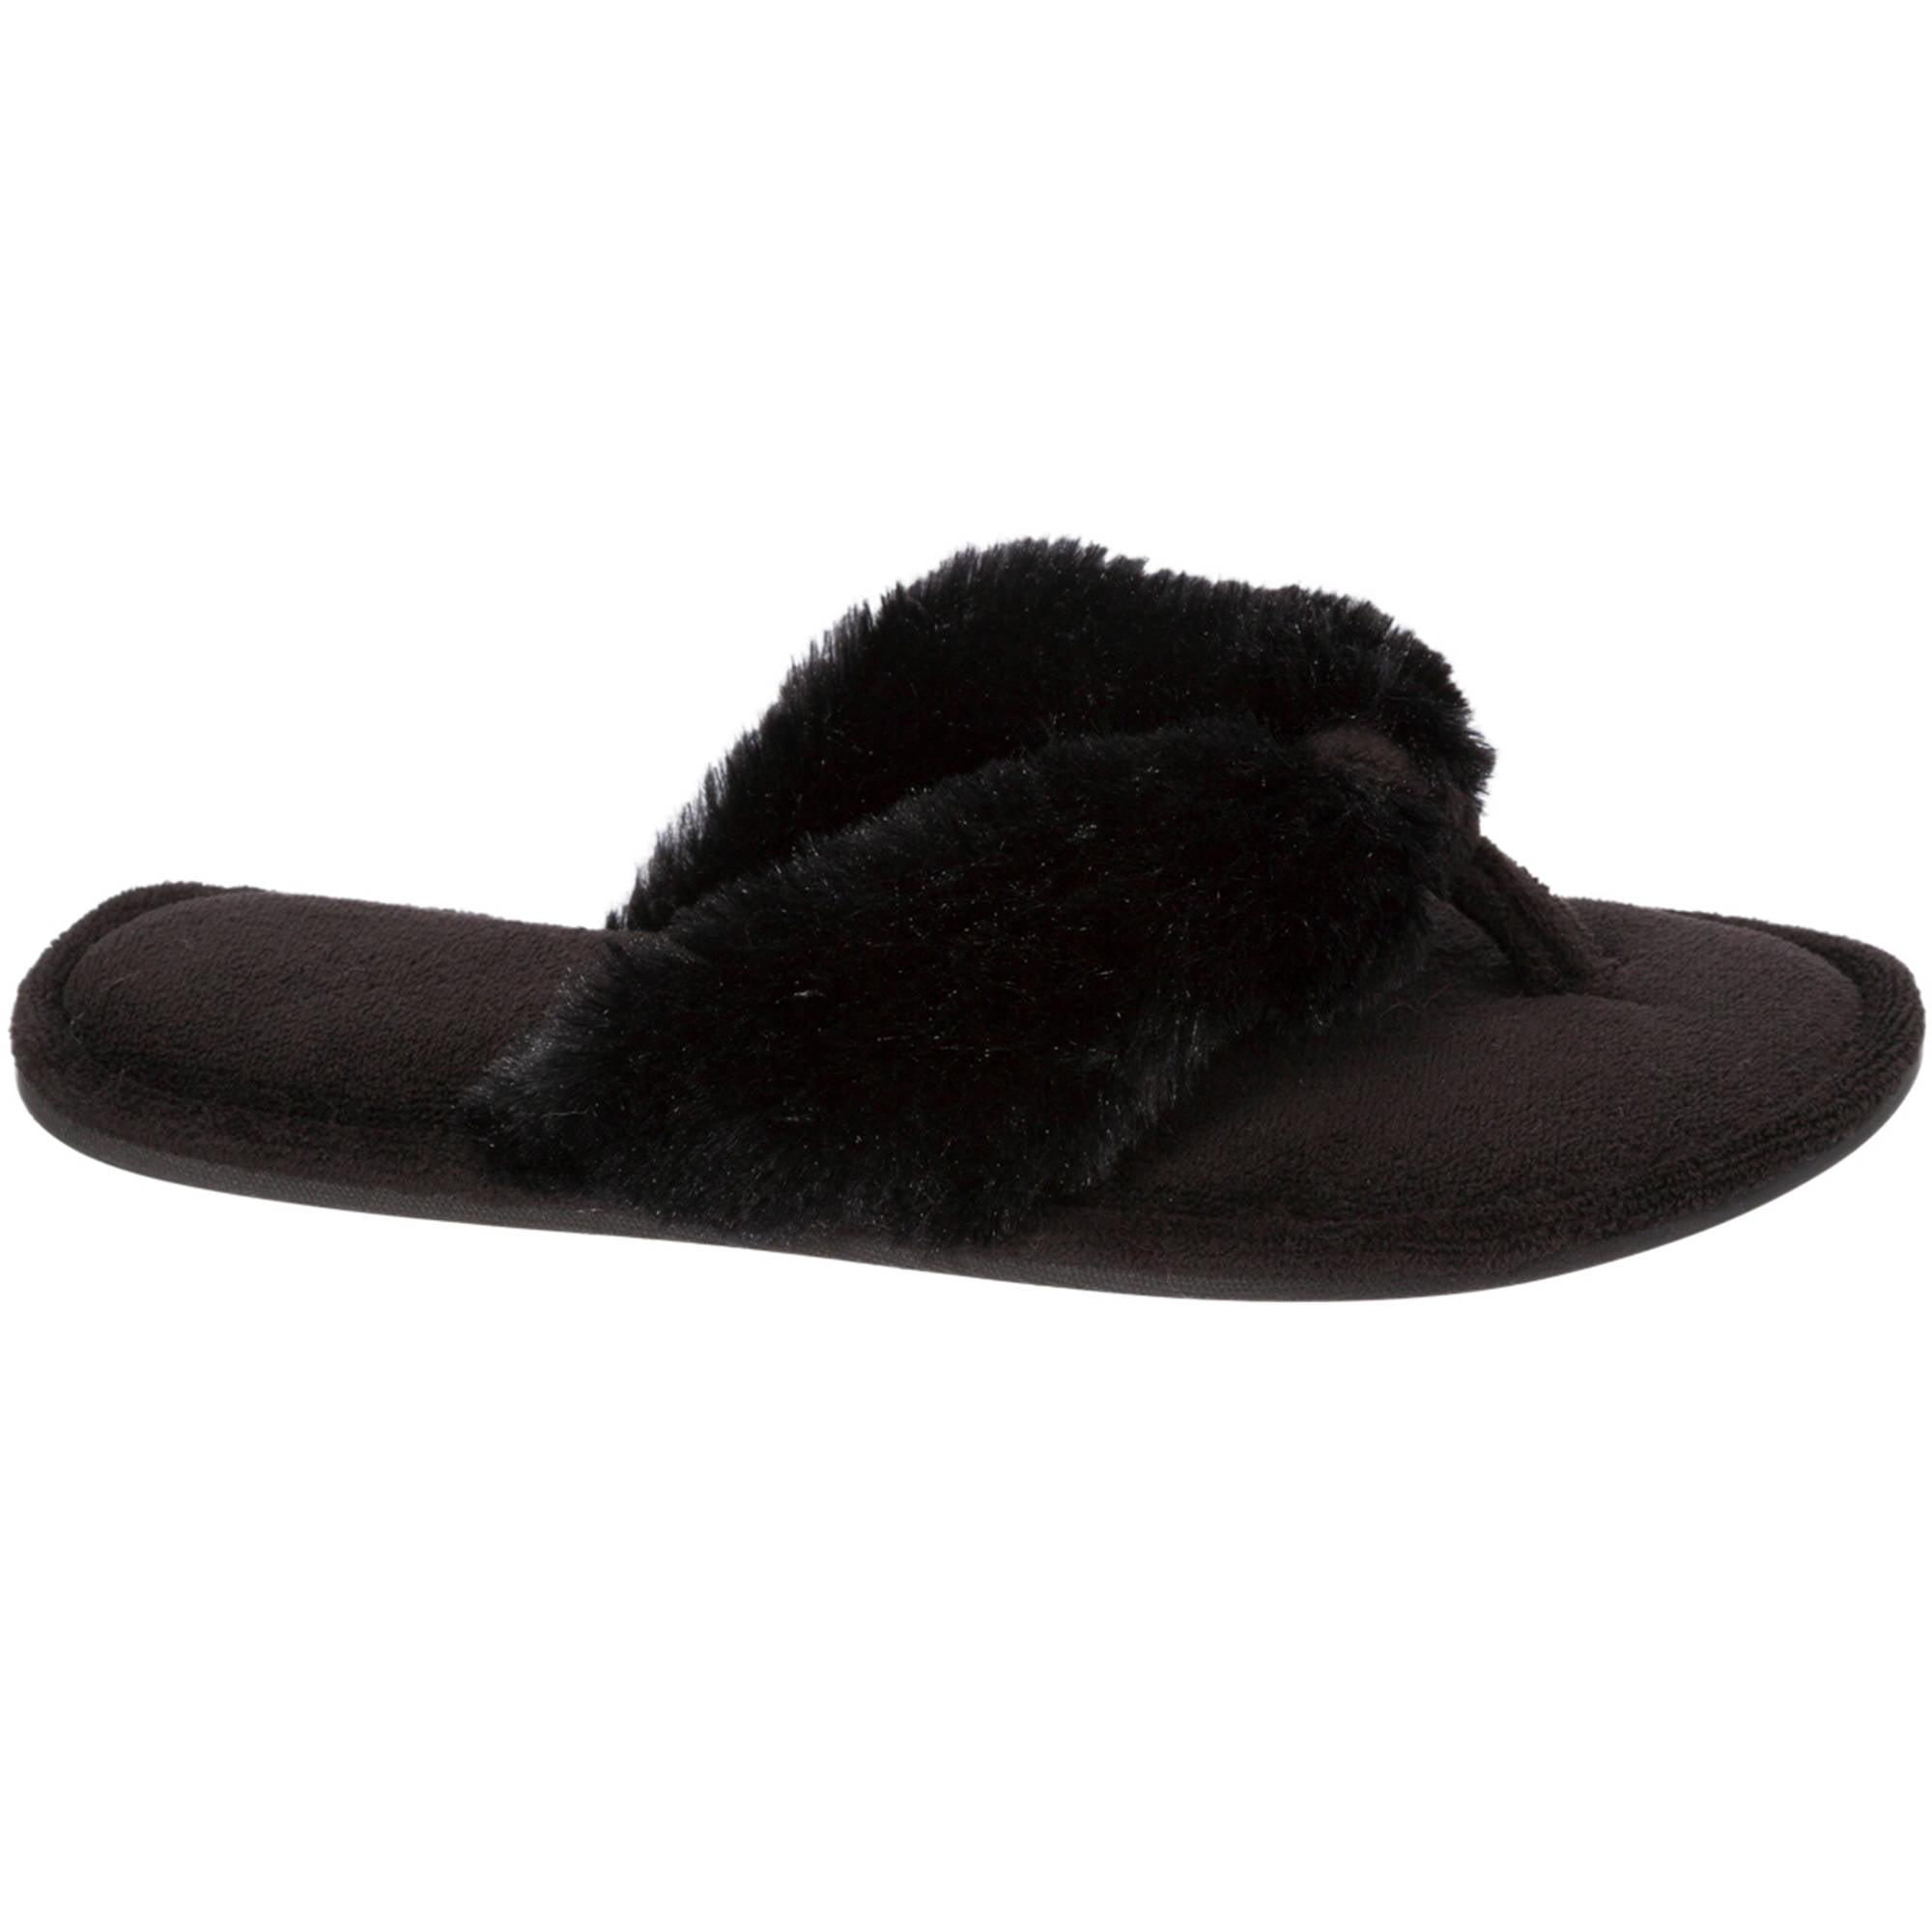 Dearfoams Women's Pile Thong Slippers, Black, Small 5-6